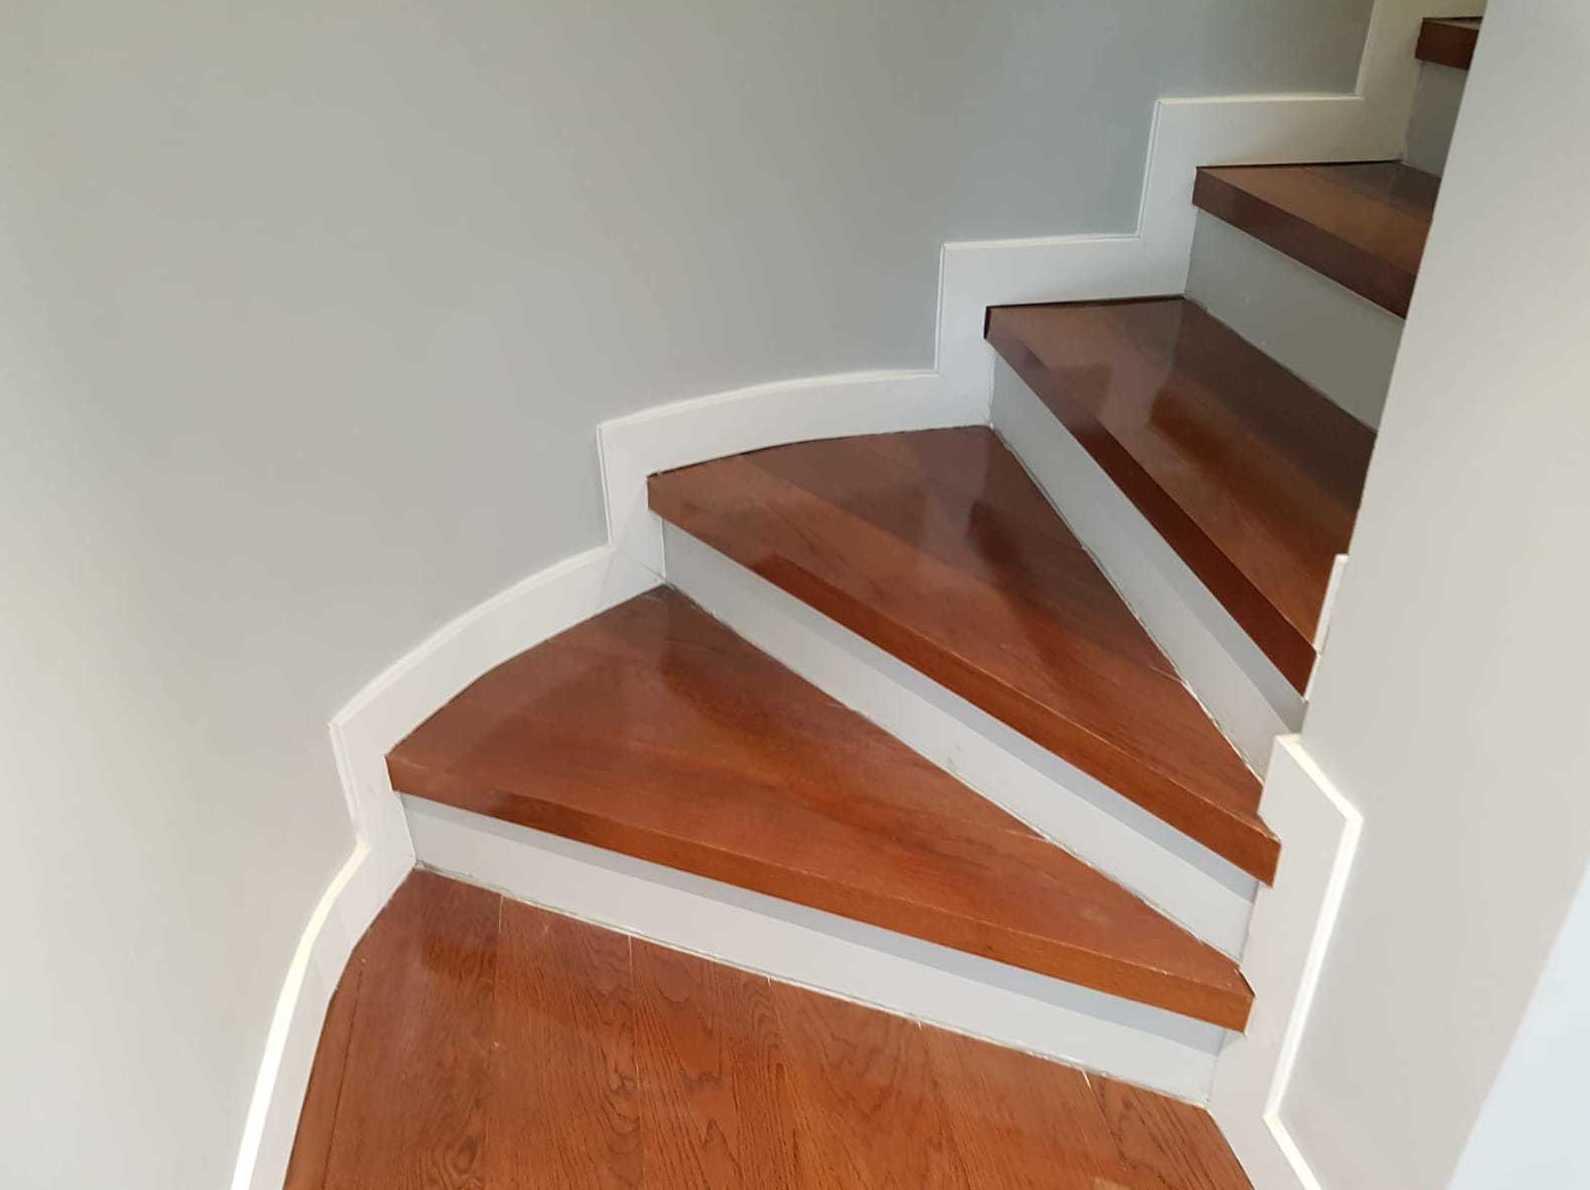 Kilenium Tarima flotante Roble teka para escaleras instalacion woodmagik en Madrid